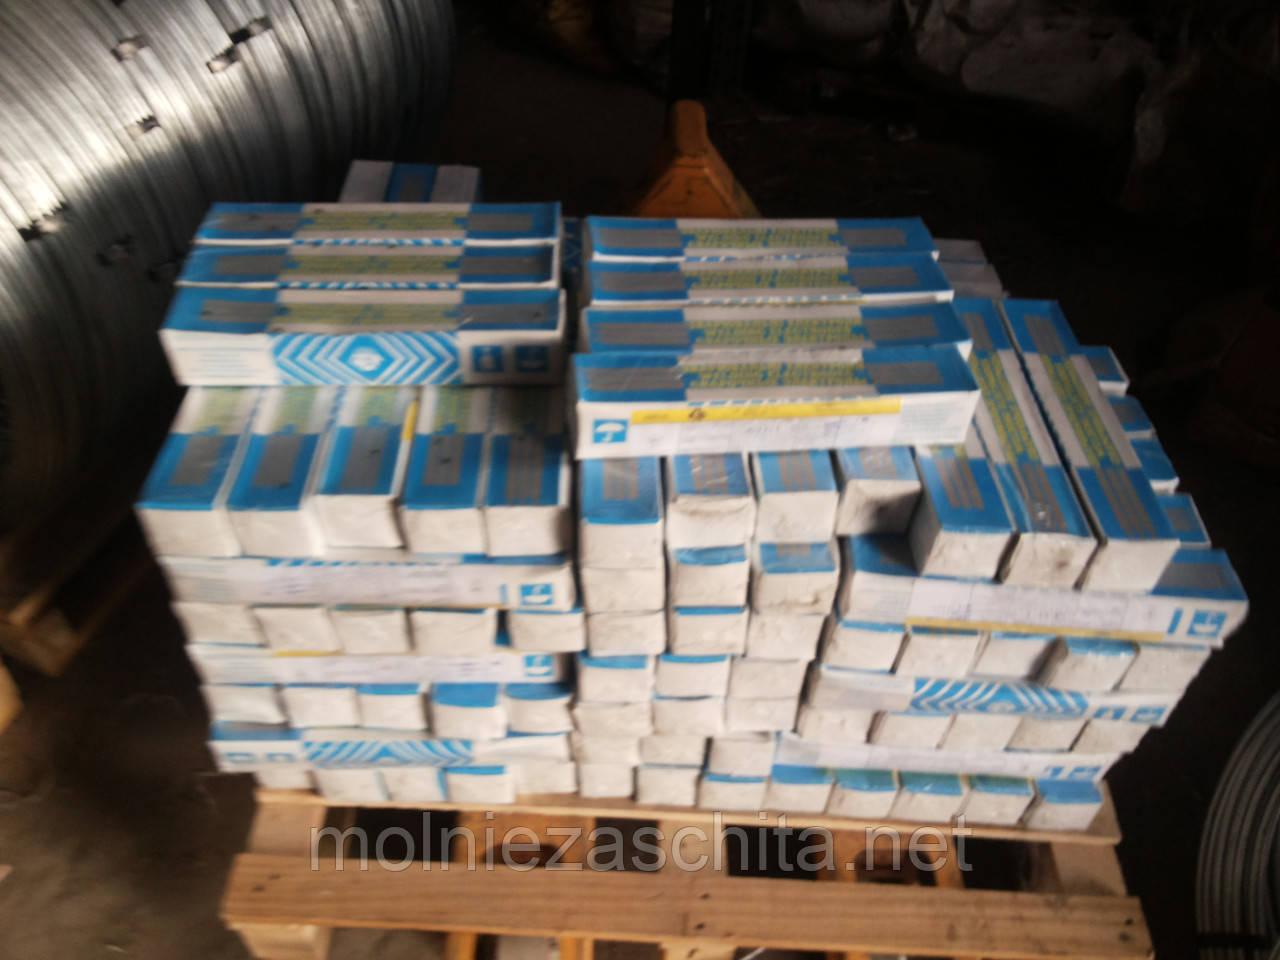 Электроды УОНИ 13/55 Ф 4 мм завод им. Патона (пачки по 5 кг, цена за 1 кг)